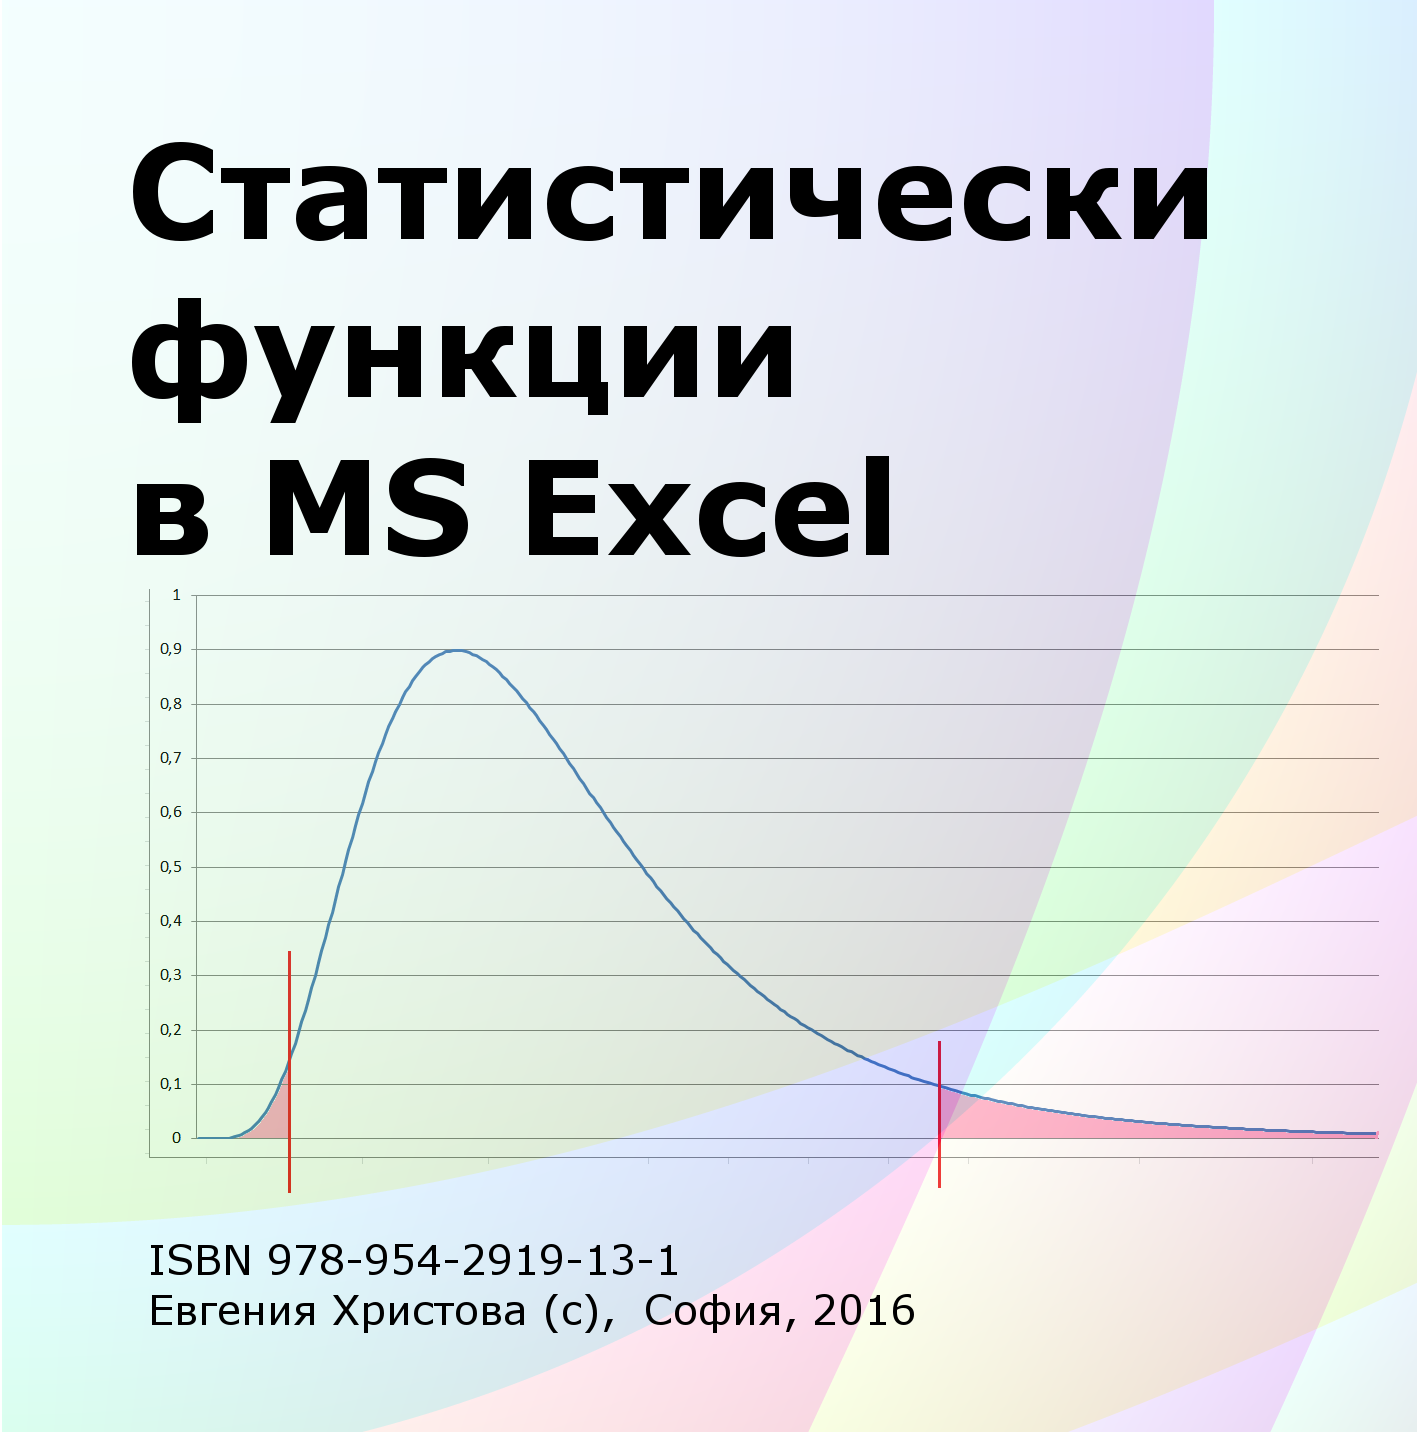 Статистически функции MS Excel